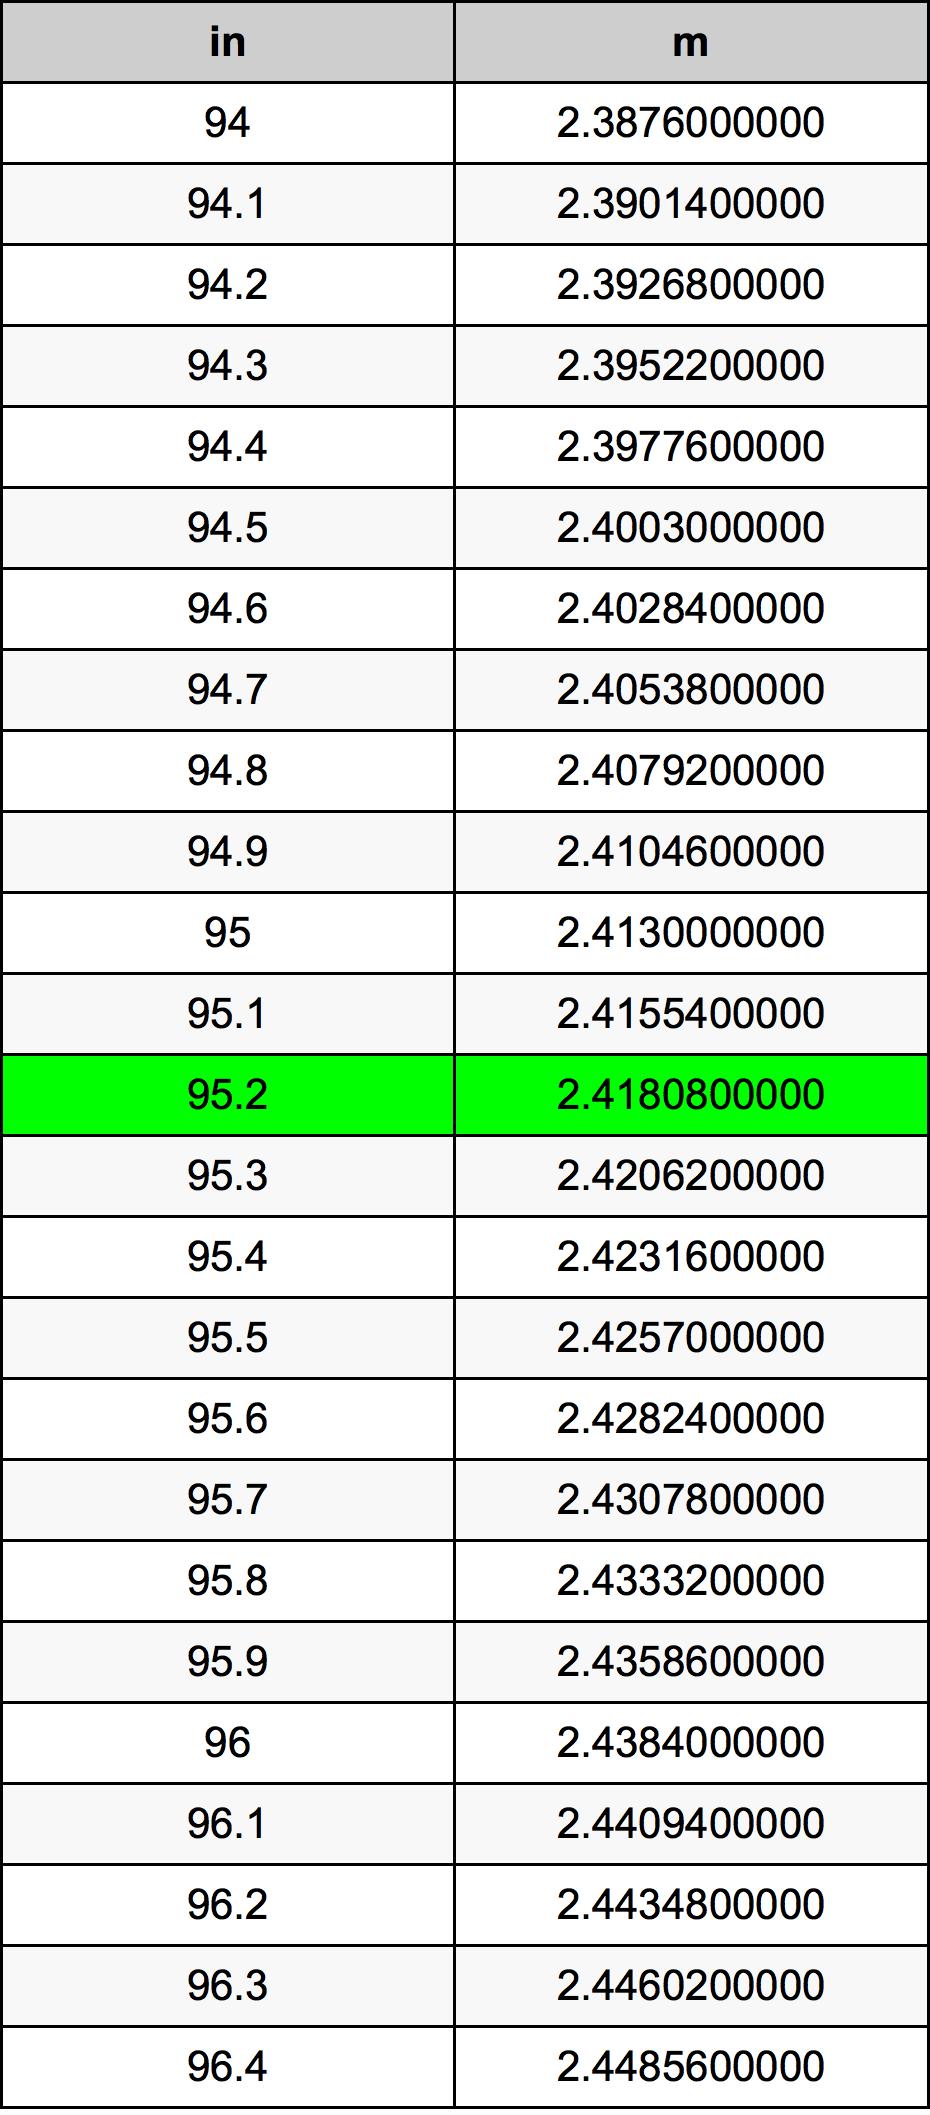 95.2 Inch konverteringstabell